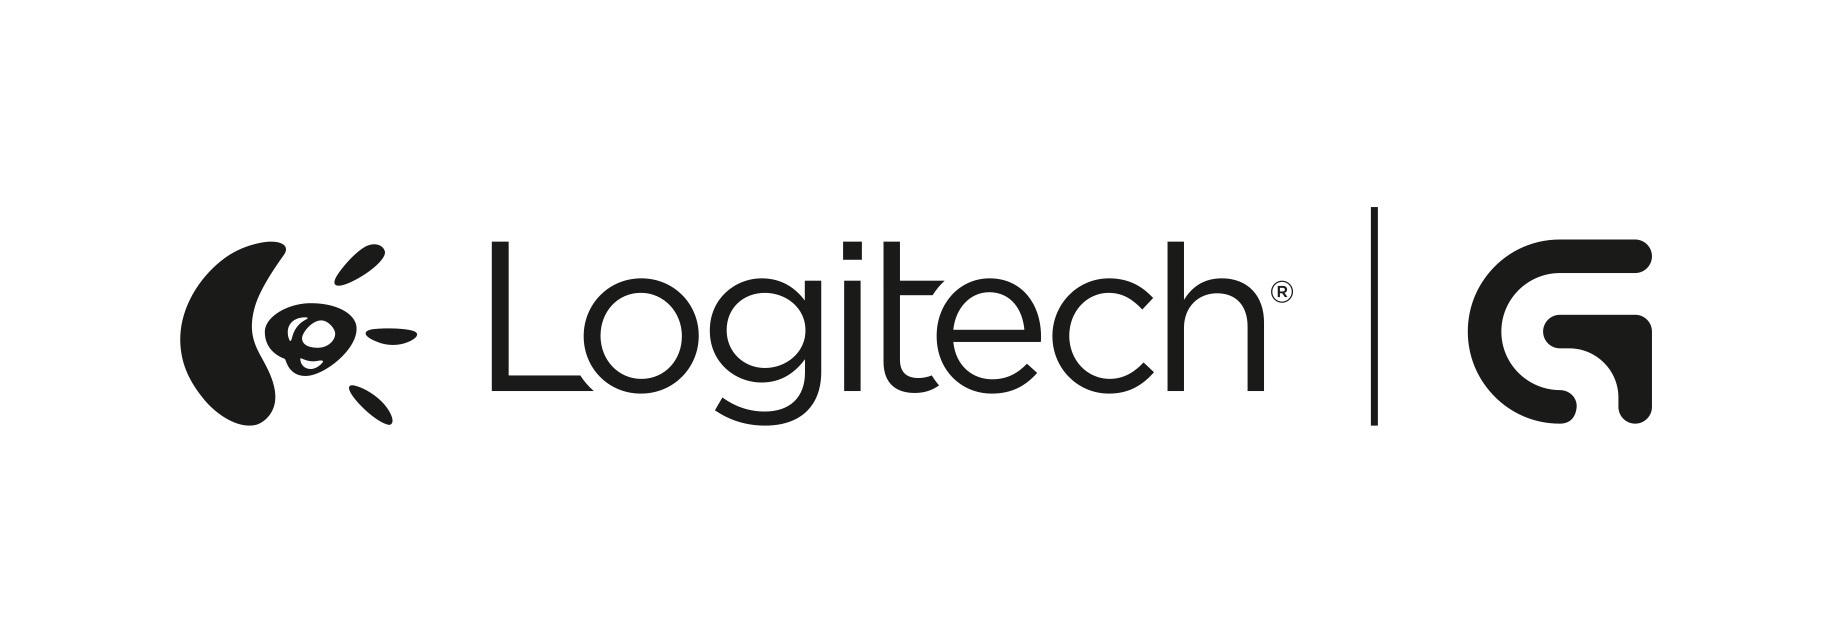 Logitech_G_black_logo